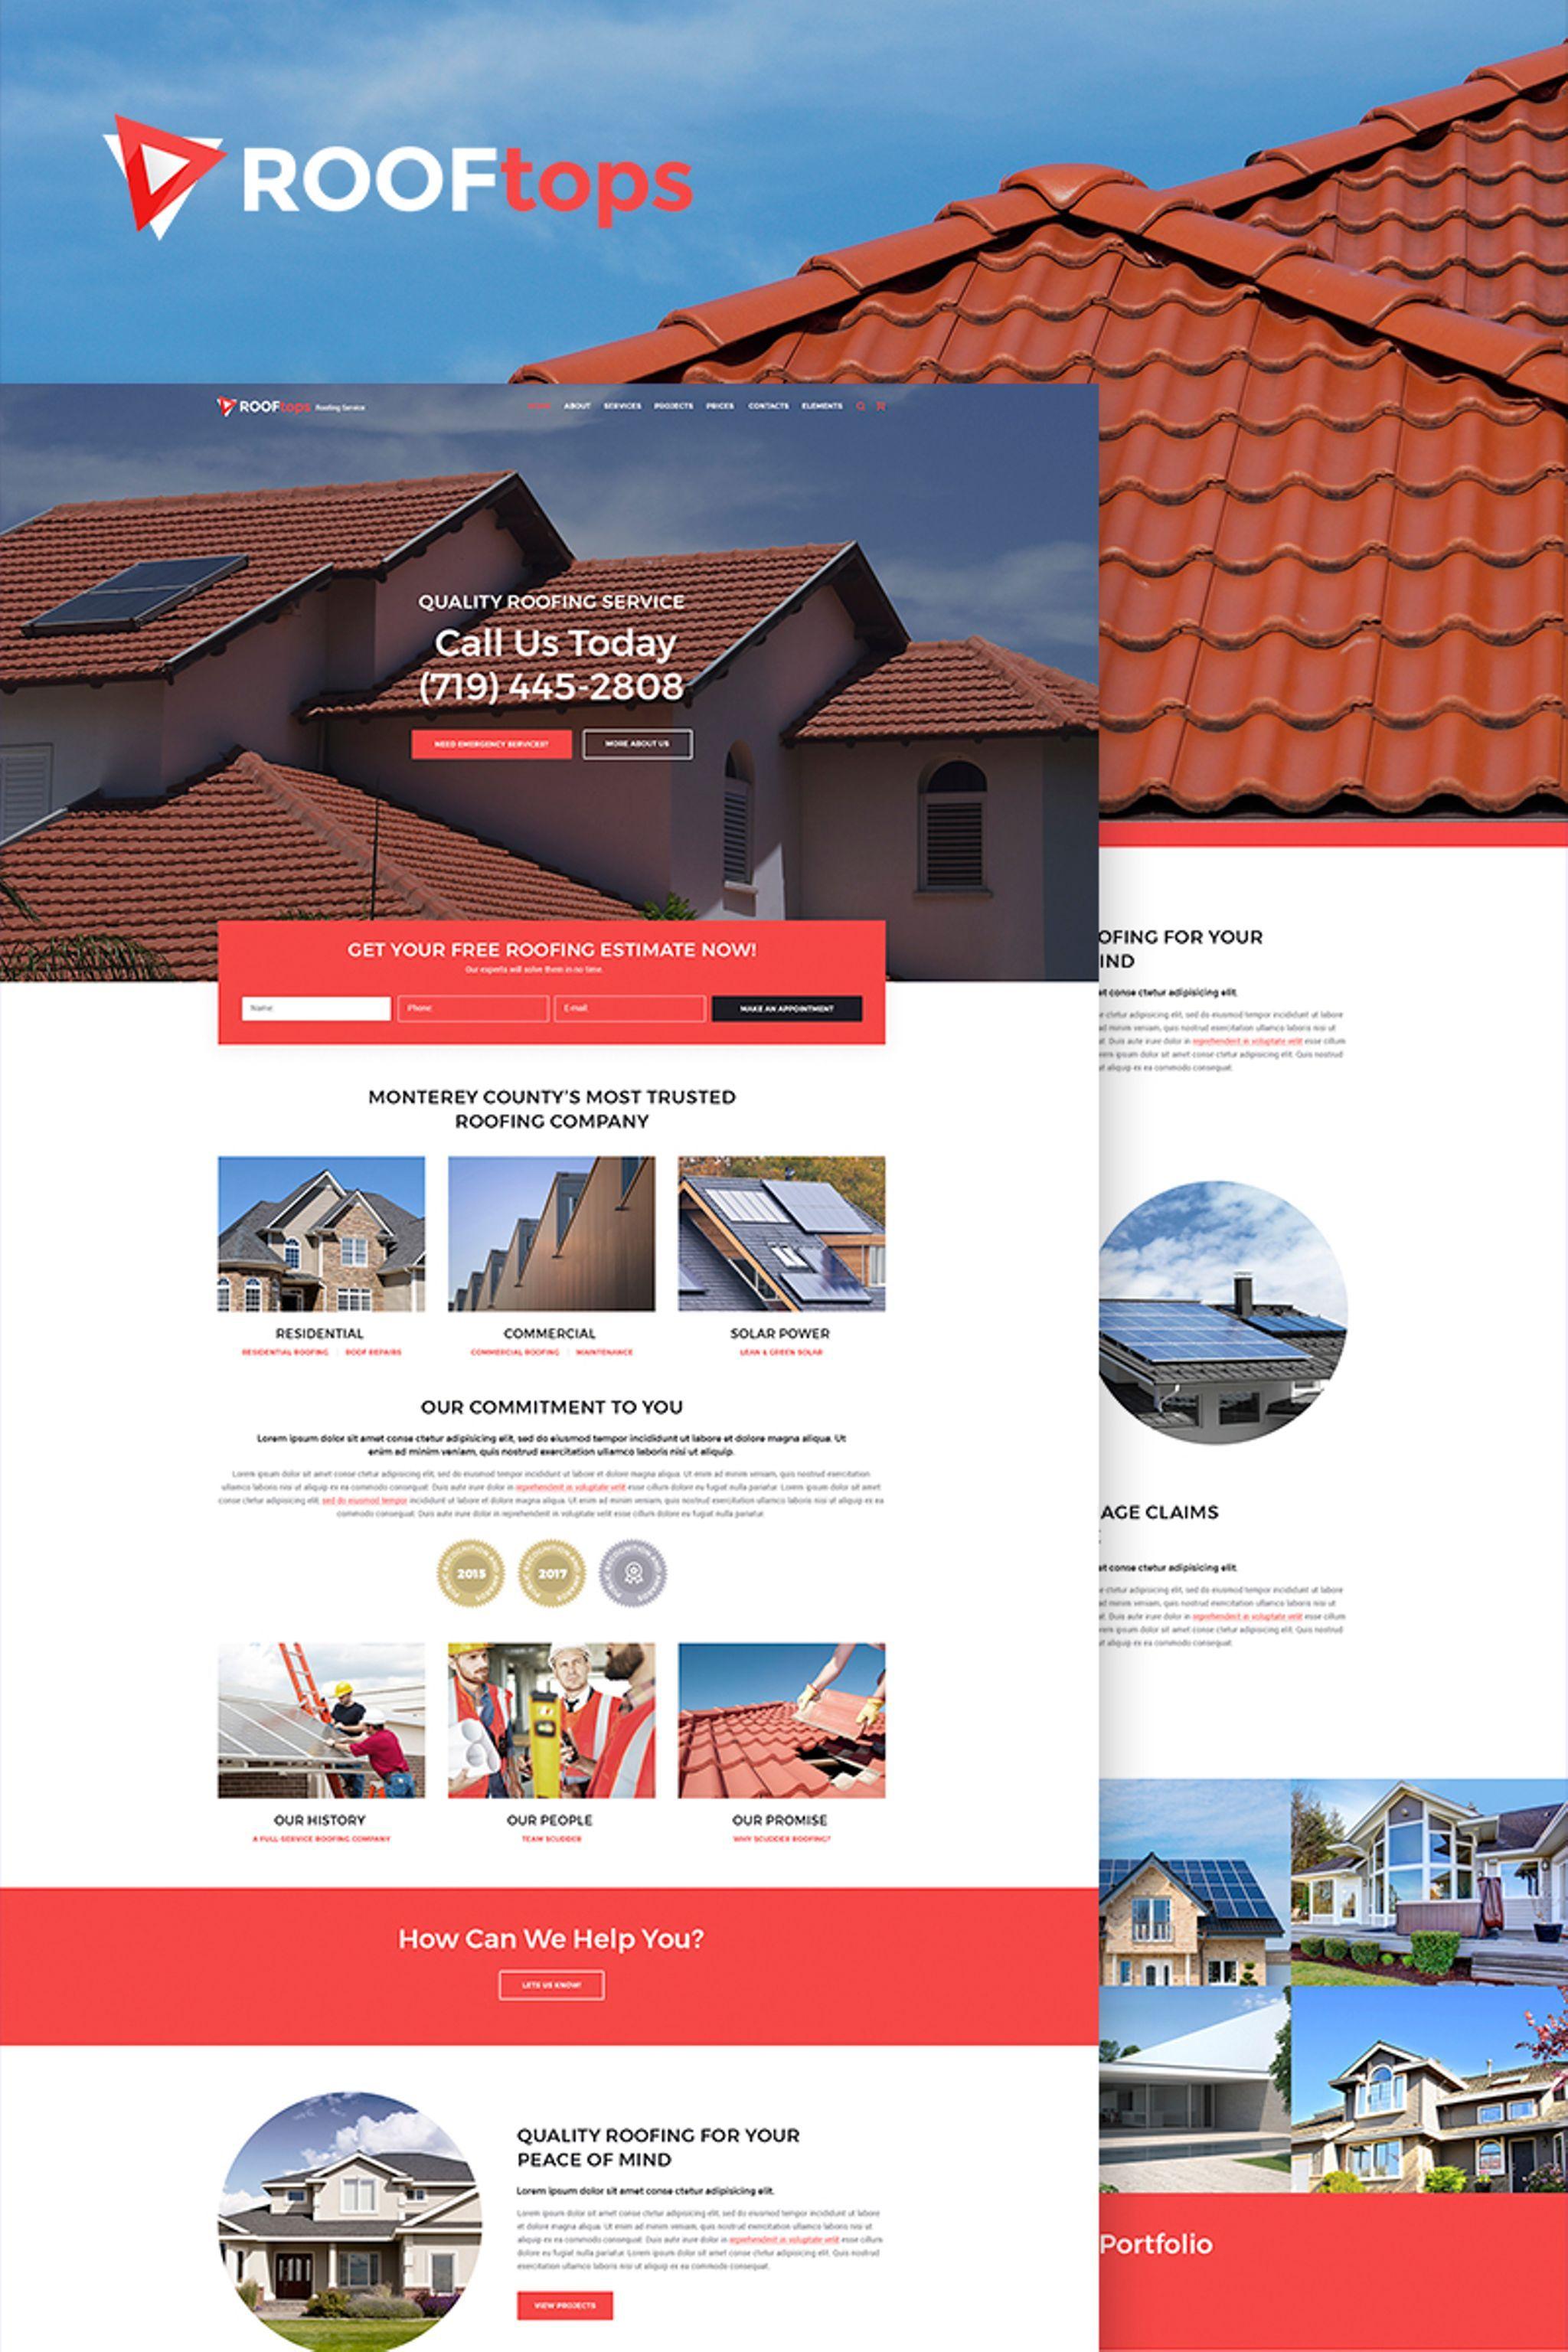 rooftops roofing service wordpress theme design bundle